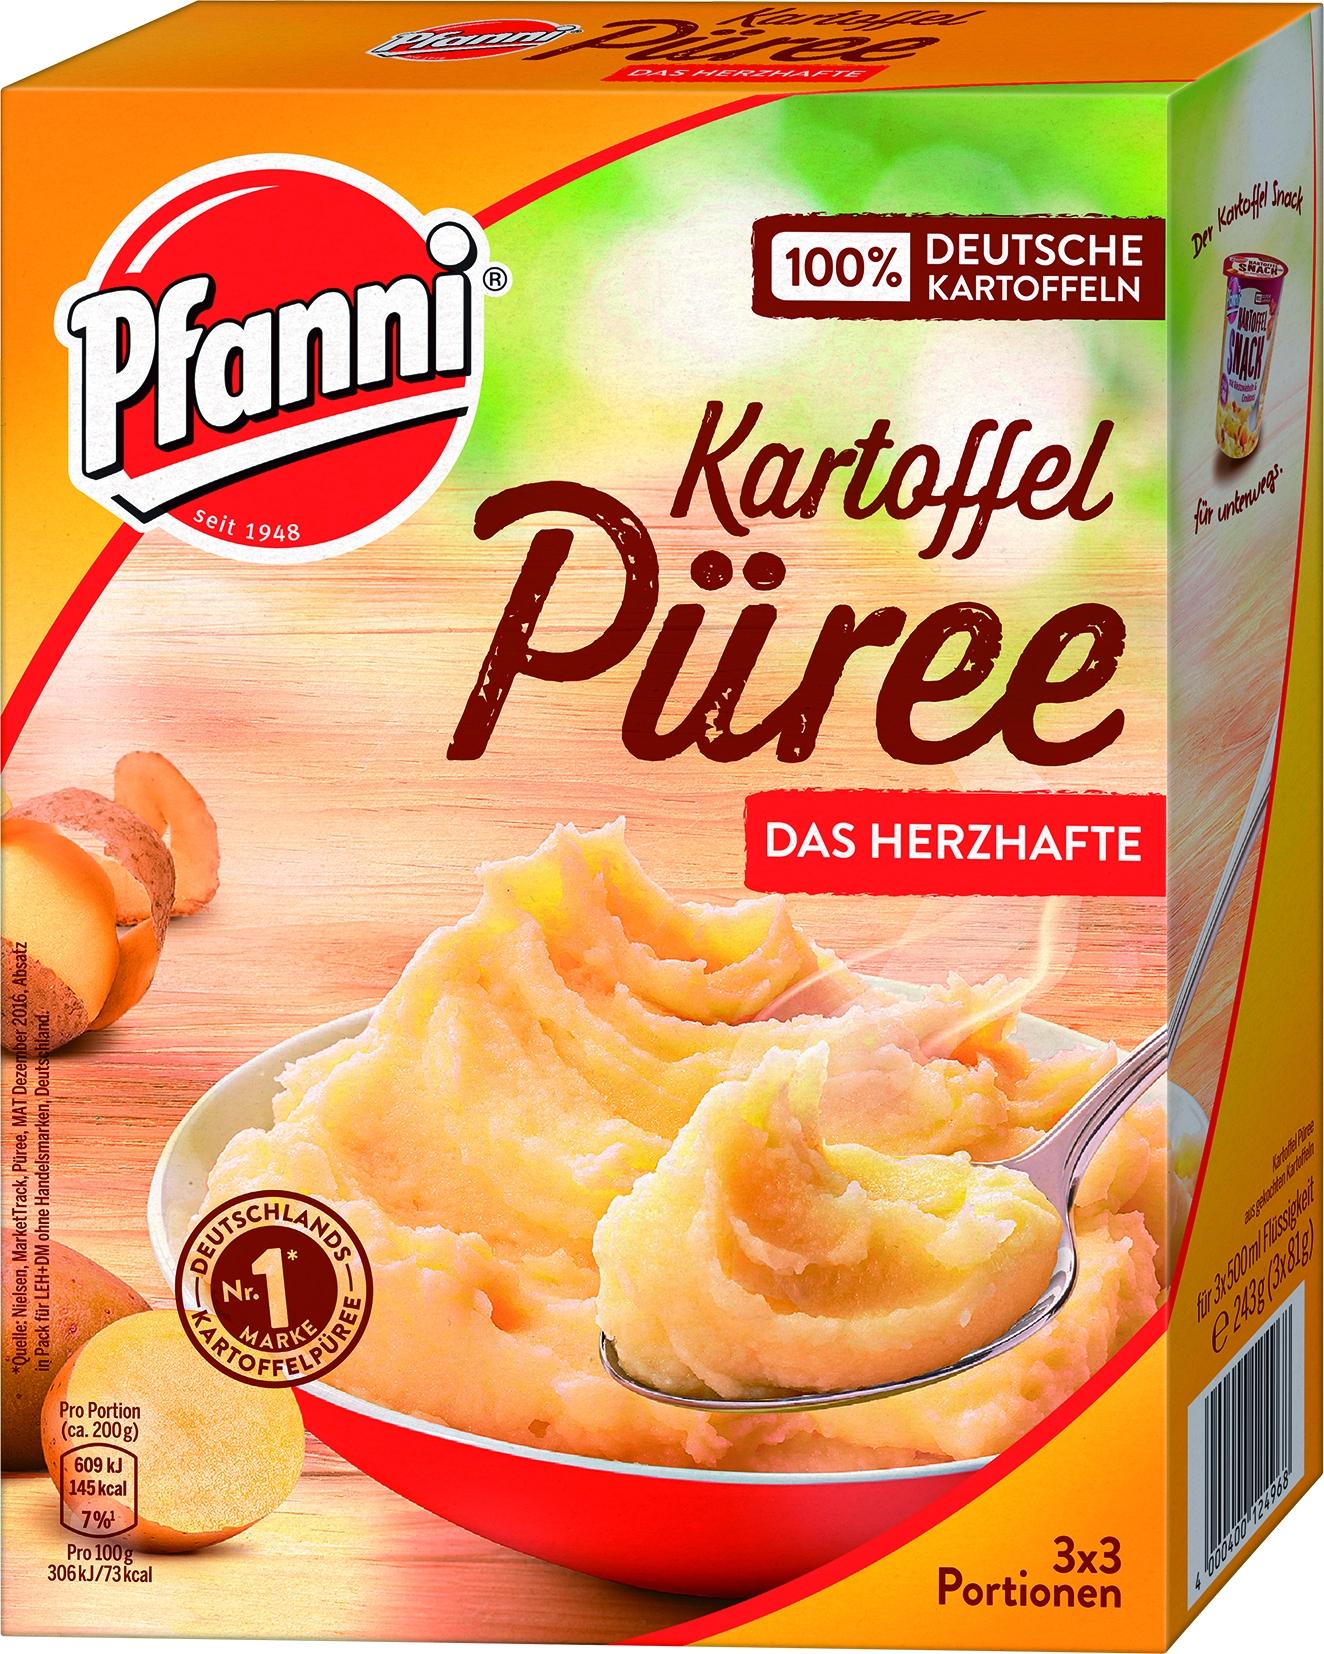 Kartoffel-Puree Kraeftig 3 x 3 Portionen